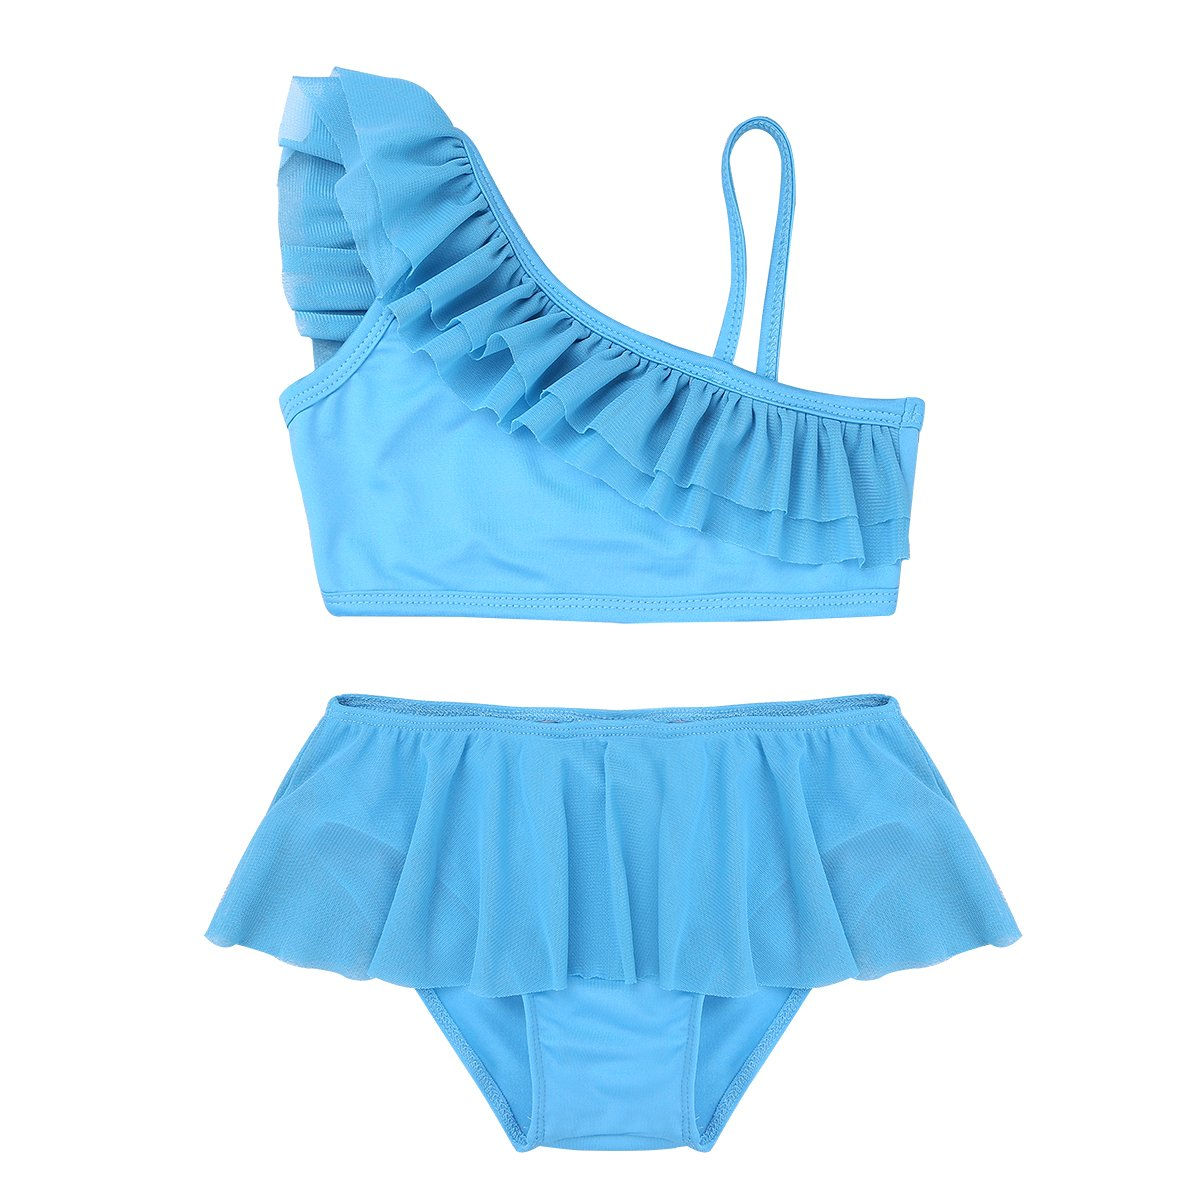 CHICTRY Little Girls Toddlers Flounce Ruffle Two Piece Tankini Swimsuit Swimwear Sets